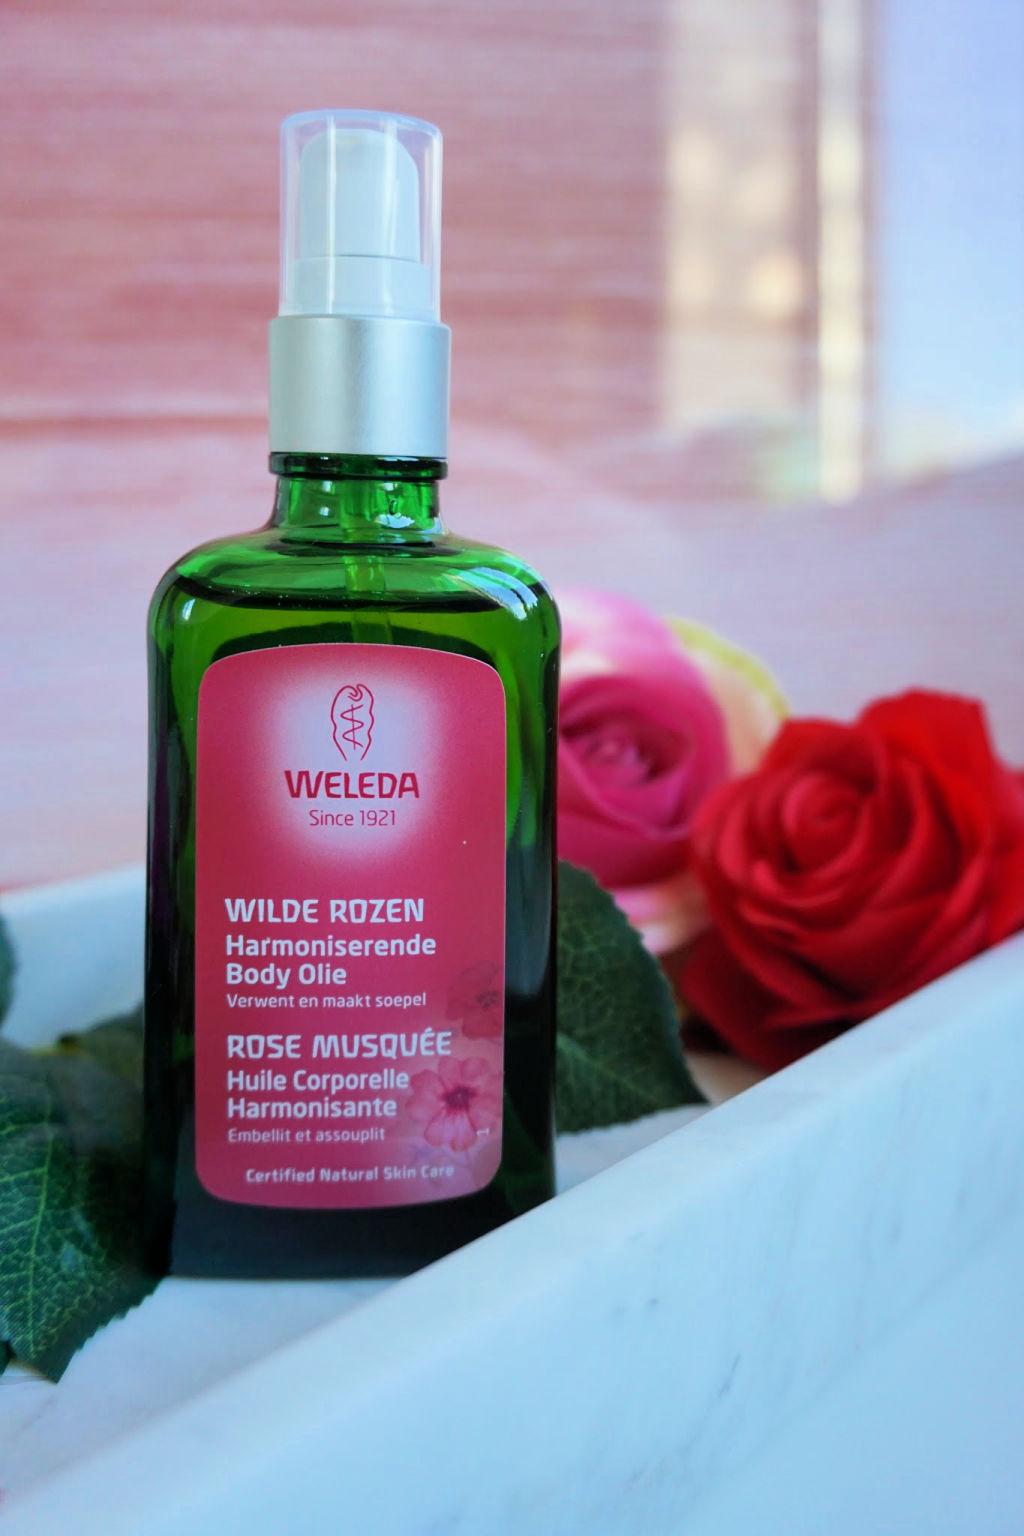 Weleda Wilde Rozen Harmoniserende Body Olie Review